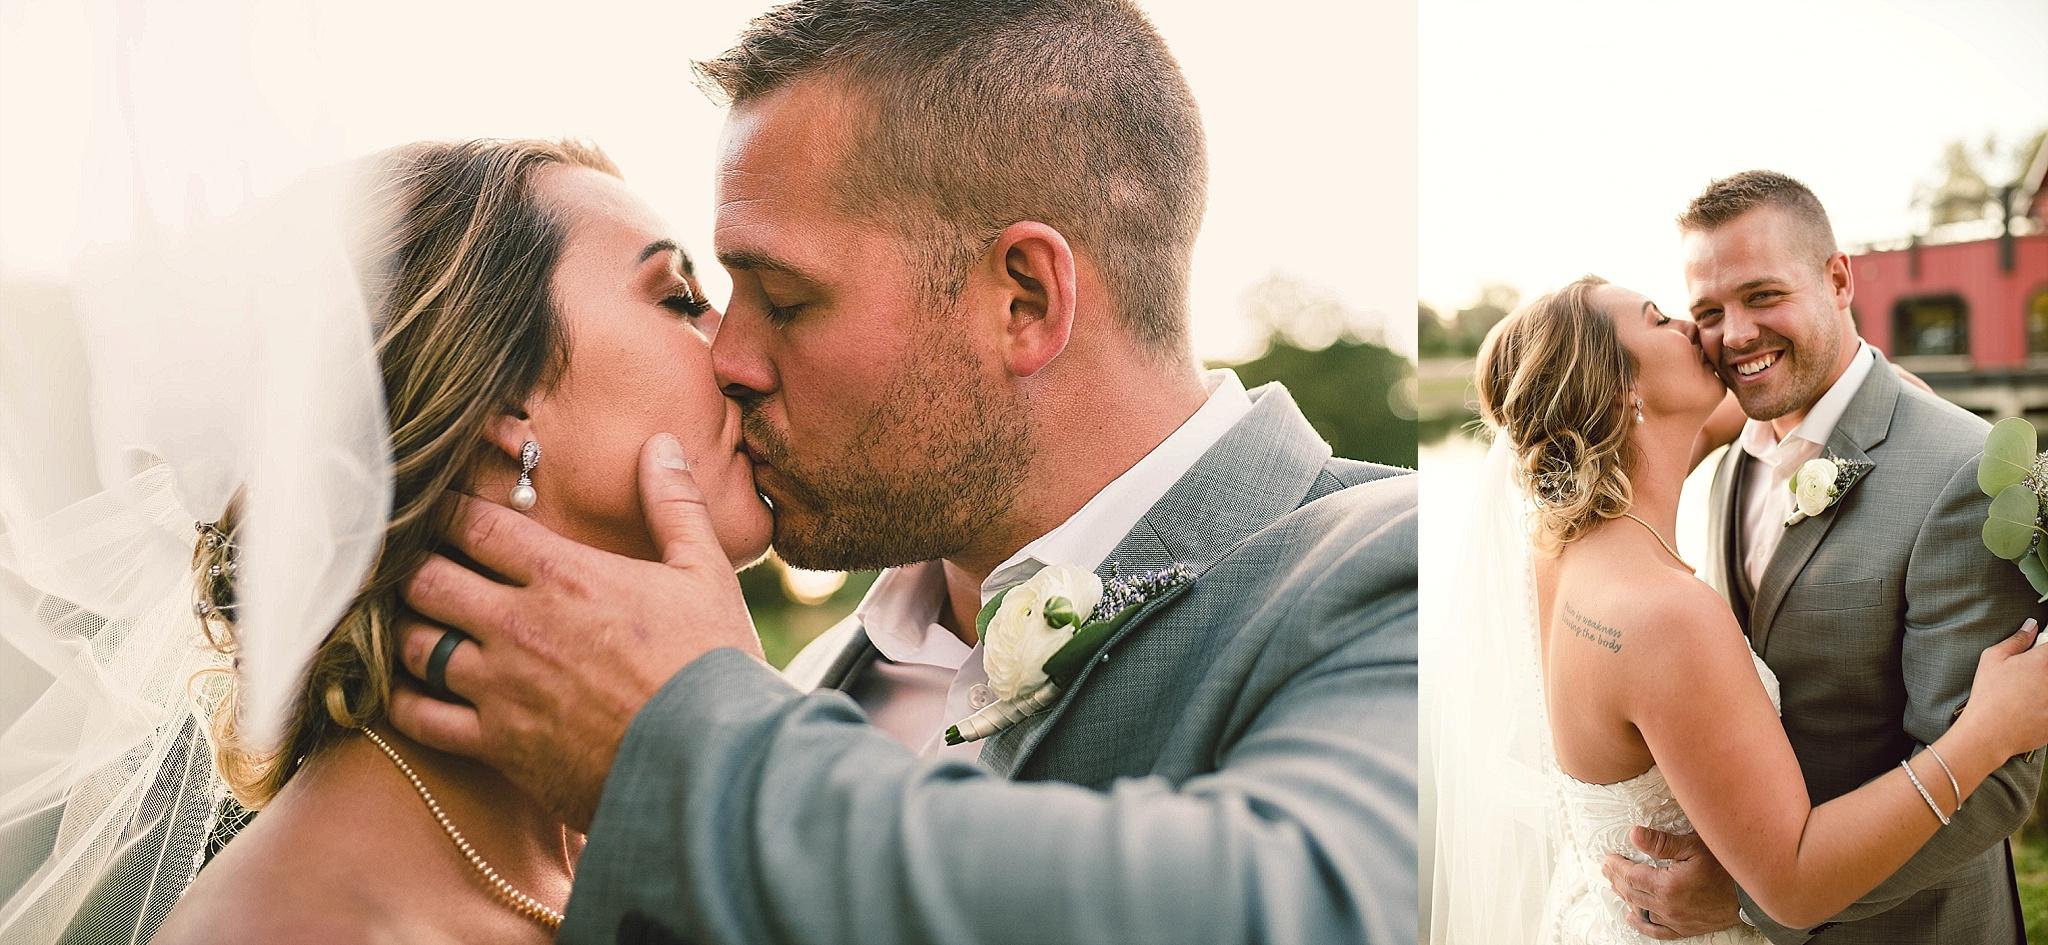 Fishermen'sInn_Wedding_Elburn_Chicago_Wedding_Photographer_1125.jpg